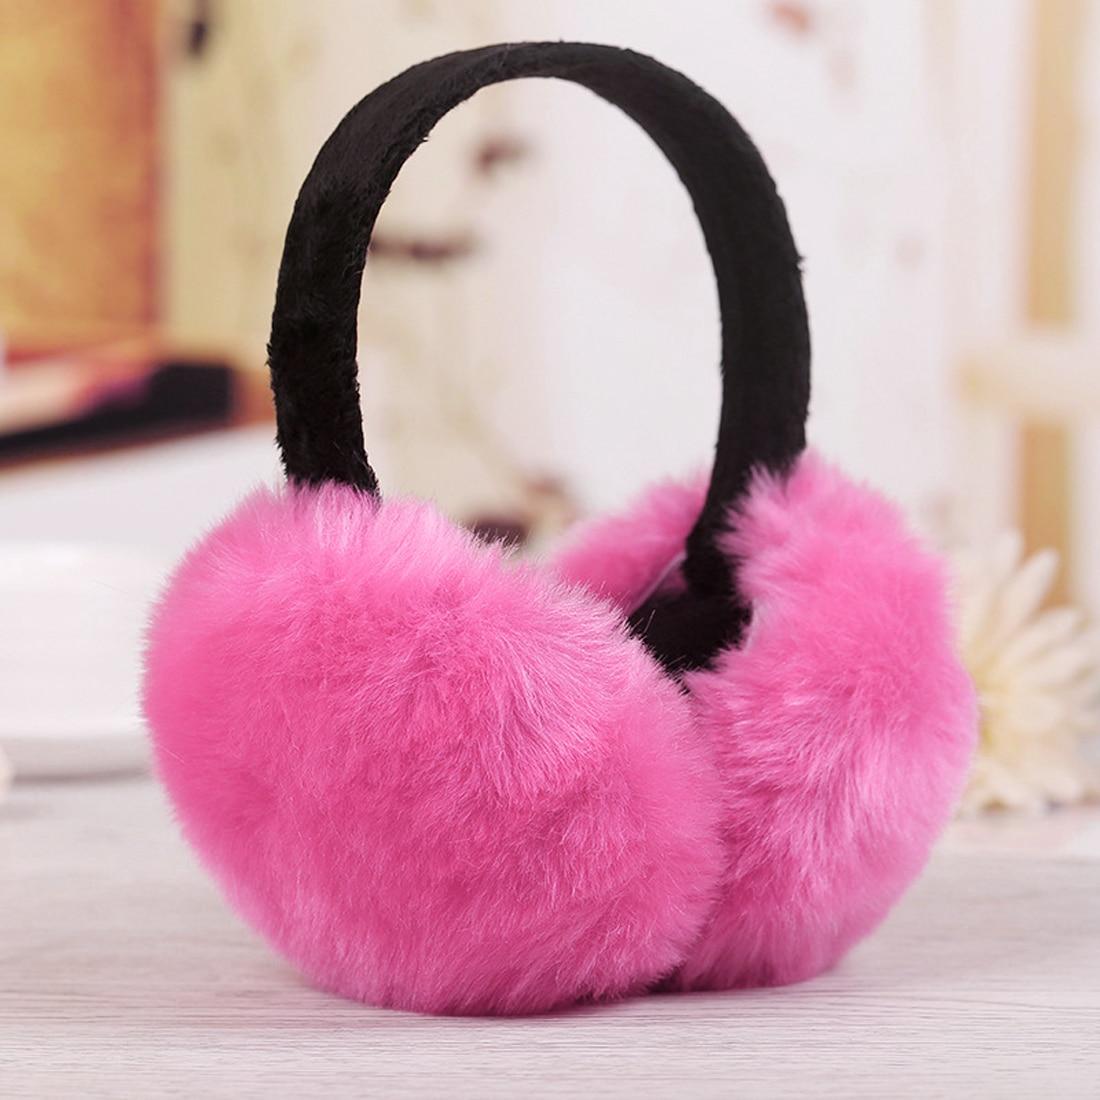 Winter Women Men Earmuffs Lovers Ear Warmer Imitation Rabbit Plush Plain Teenage Earmuffs Student Girl Ear Muffs